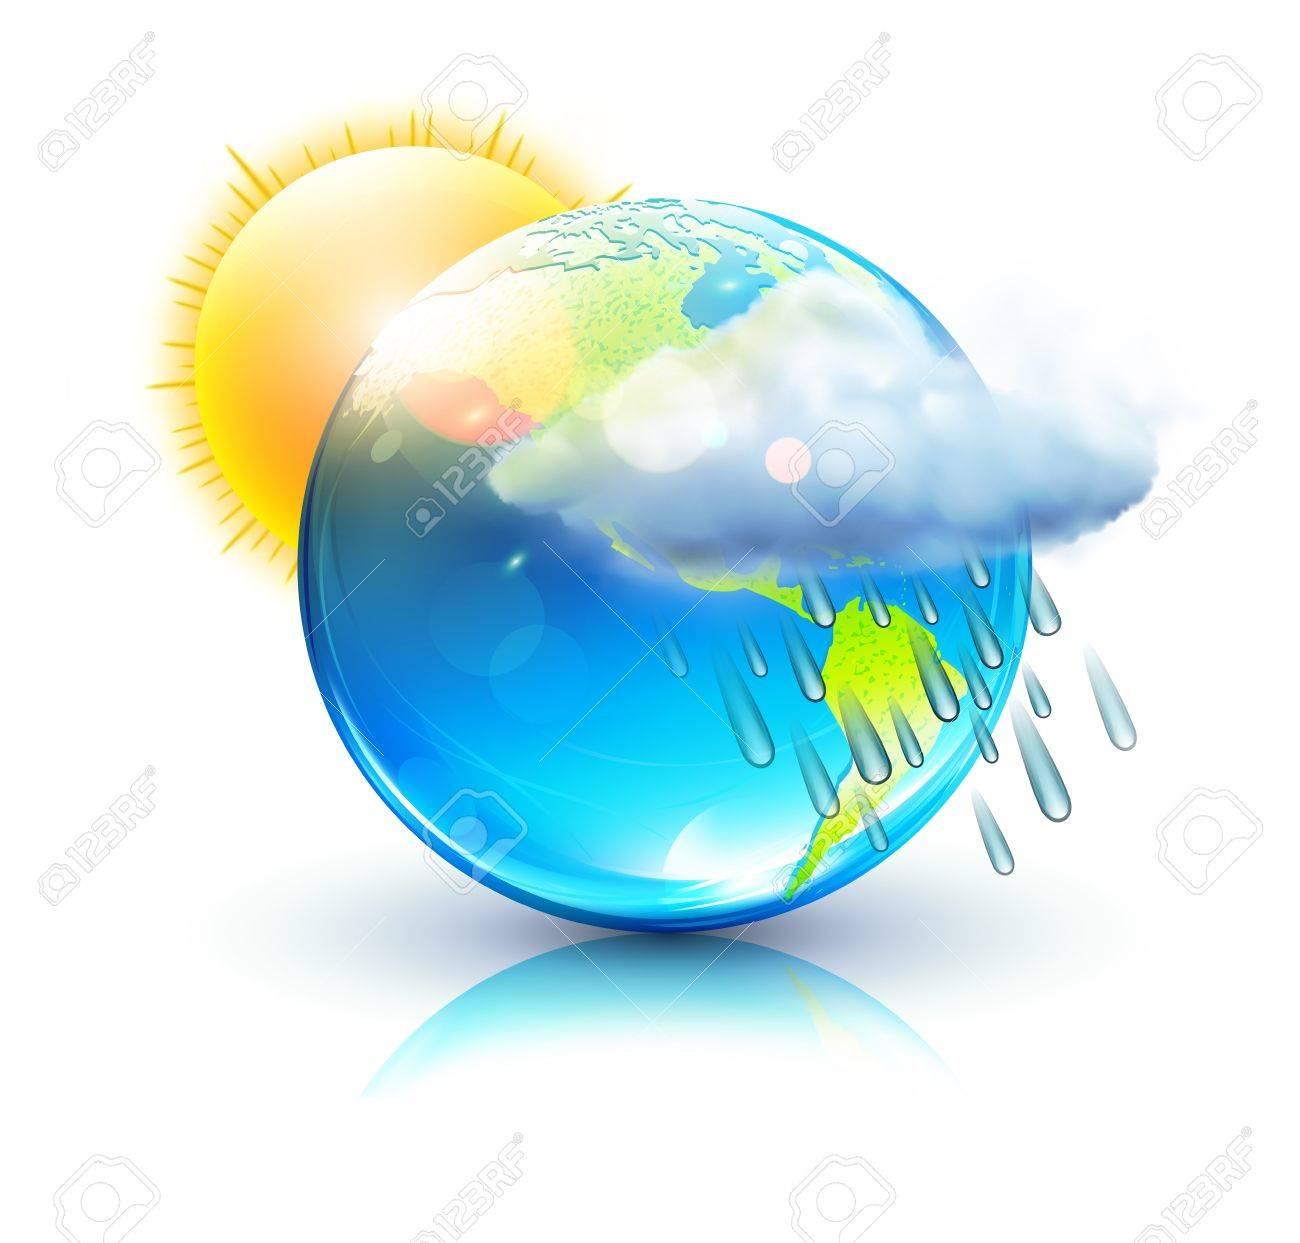 illustration of cool single weather icon &acirc,%uFFFD%uFFFD blue globe with sun, raincloud and raindrops - 12340255